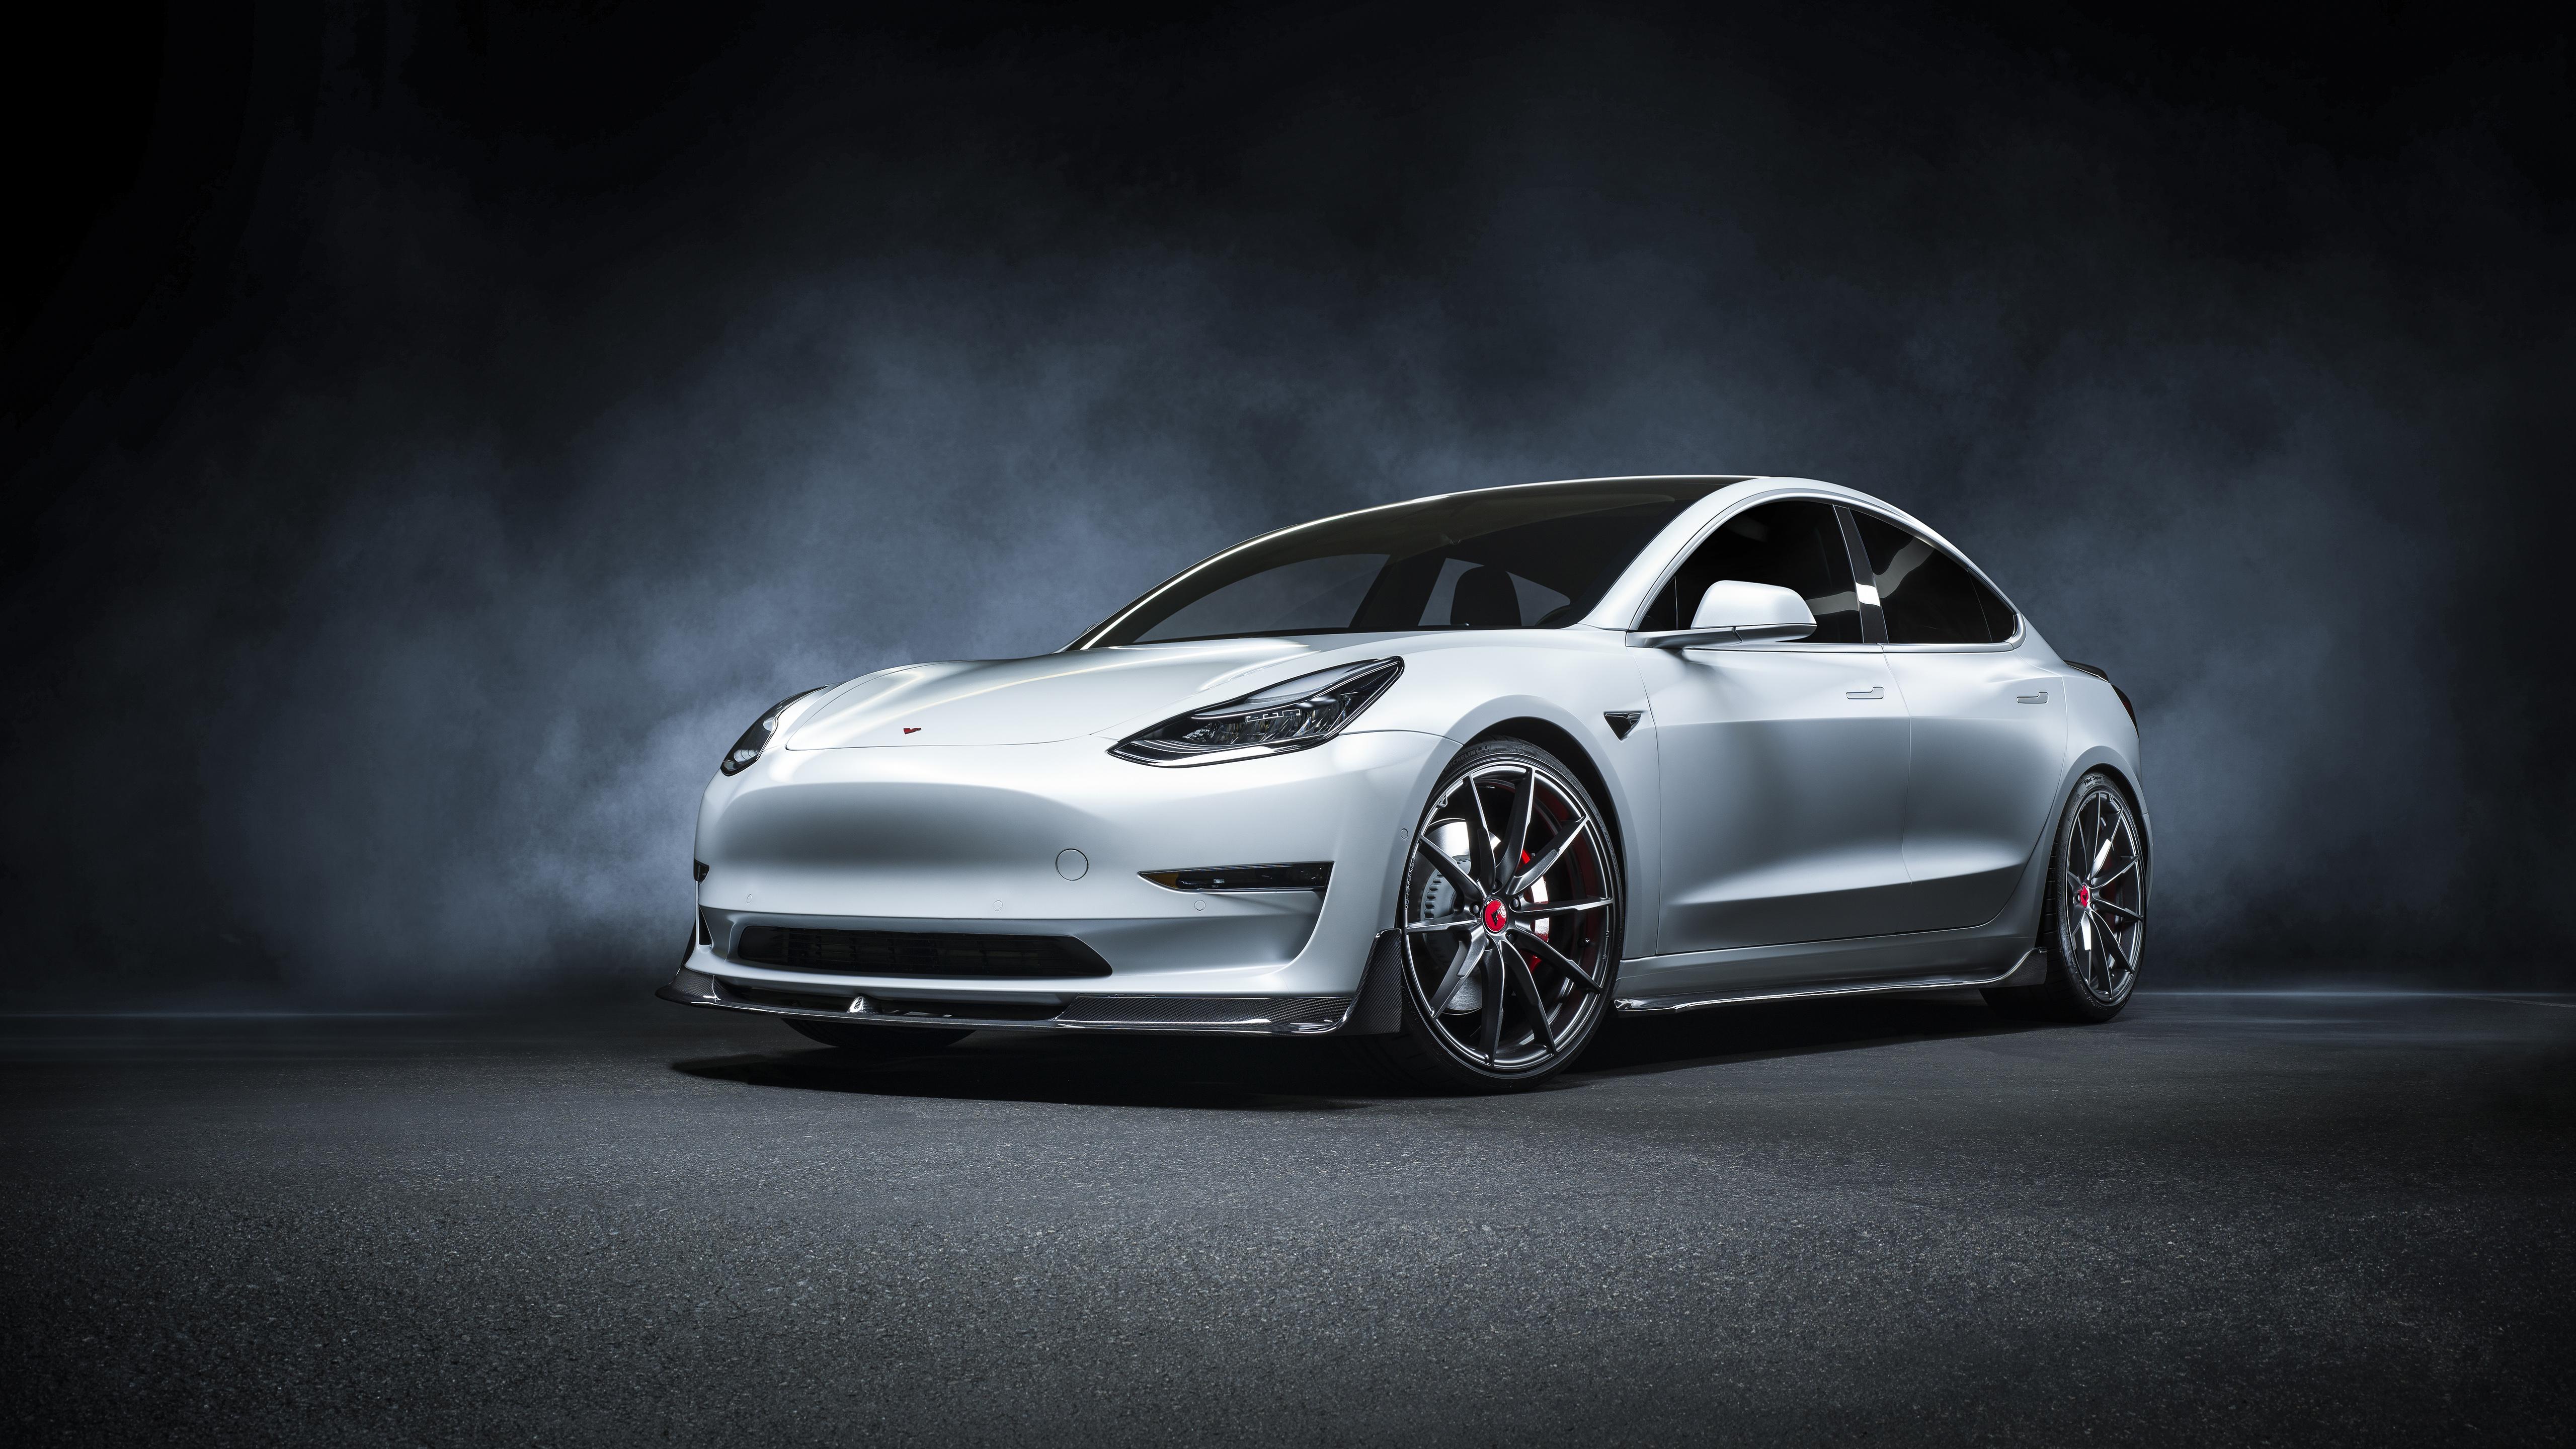 Vorsteiner Tesla Model 3 Volta 2019 4k Wallpaper Hd Car